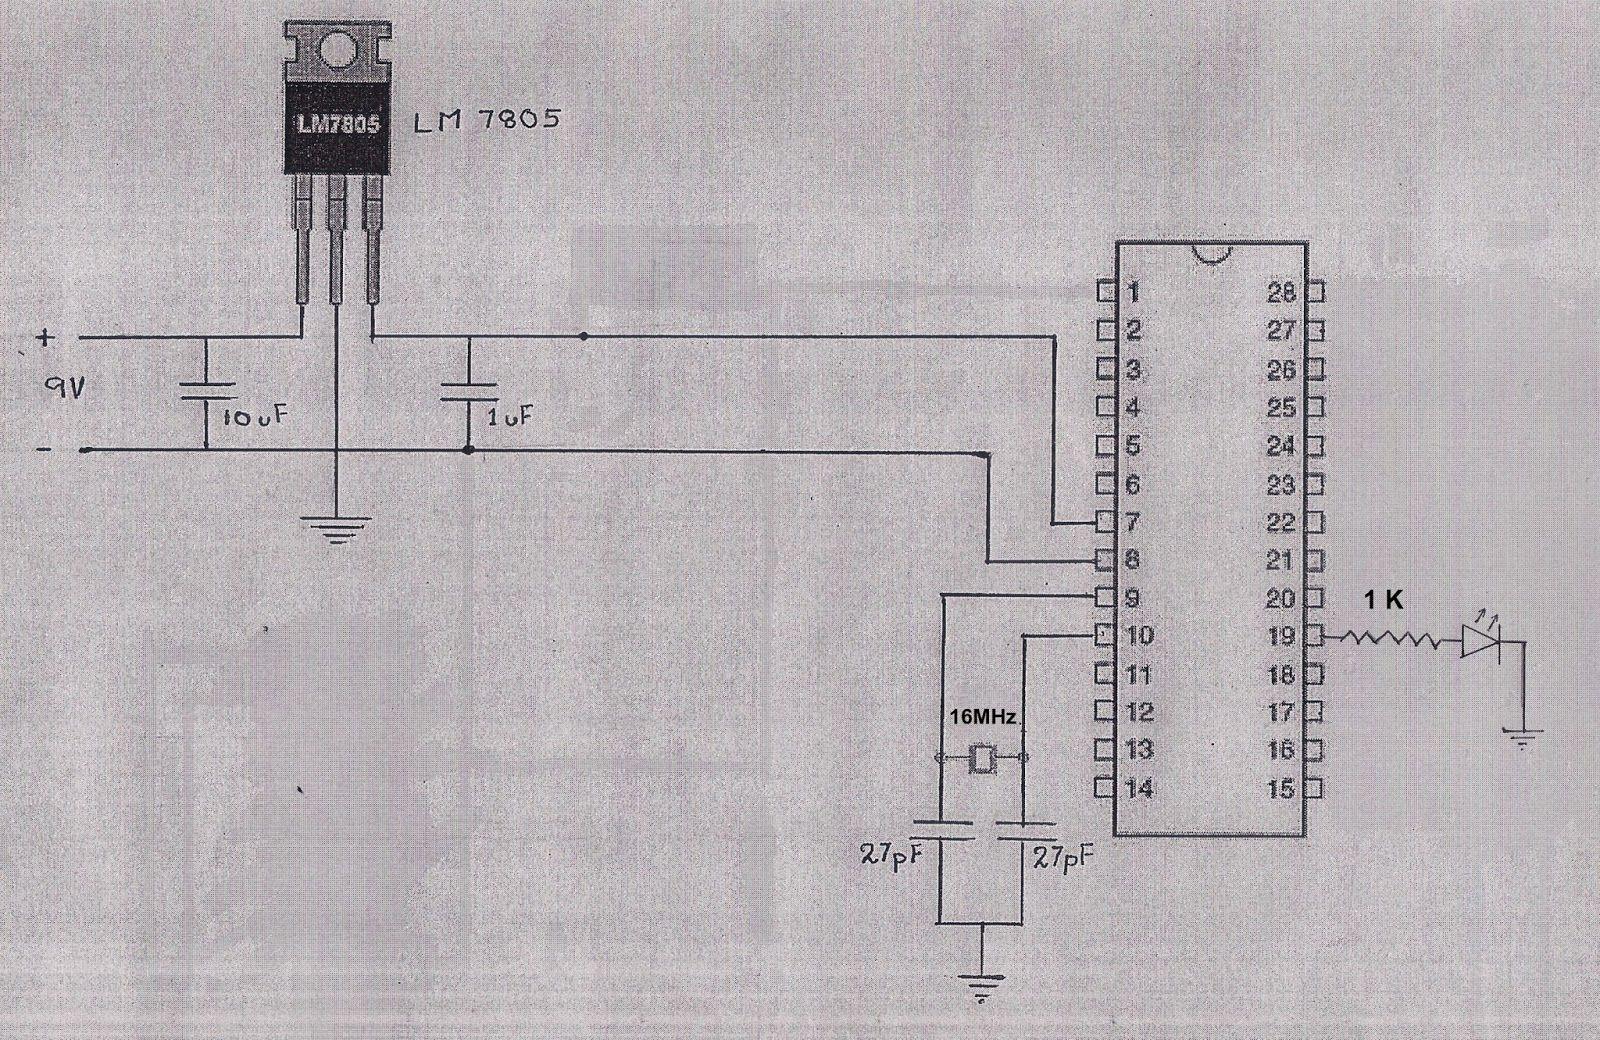 Seperate Atmega328 Microcontroller From Arduino Board